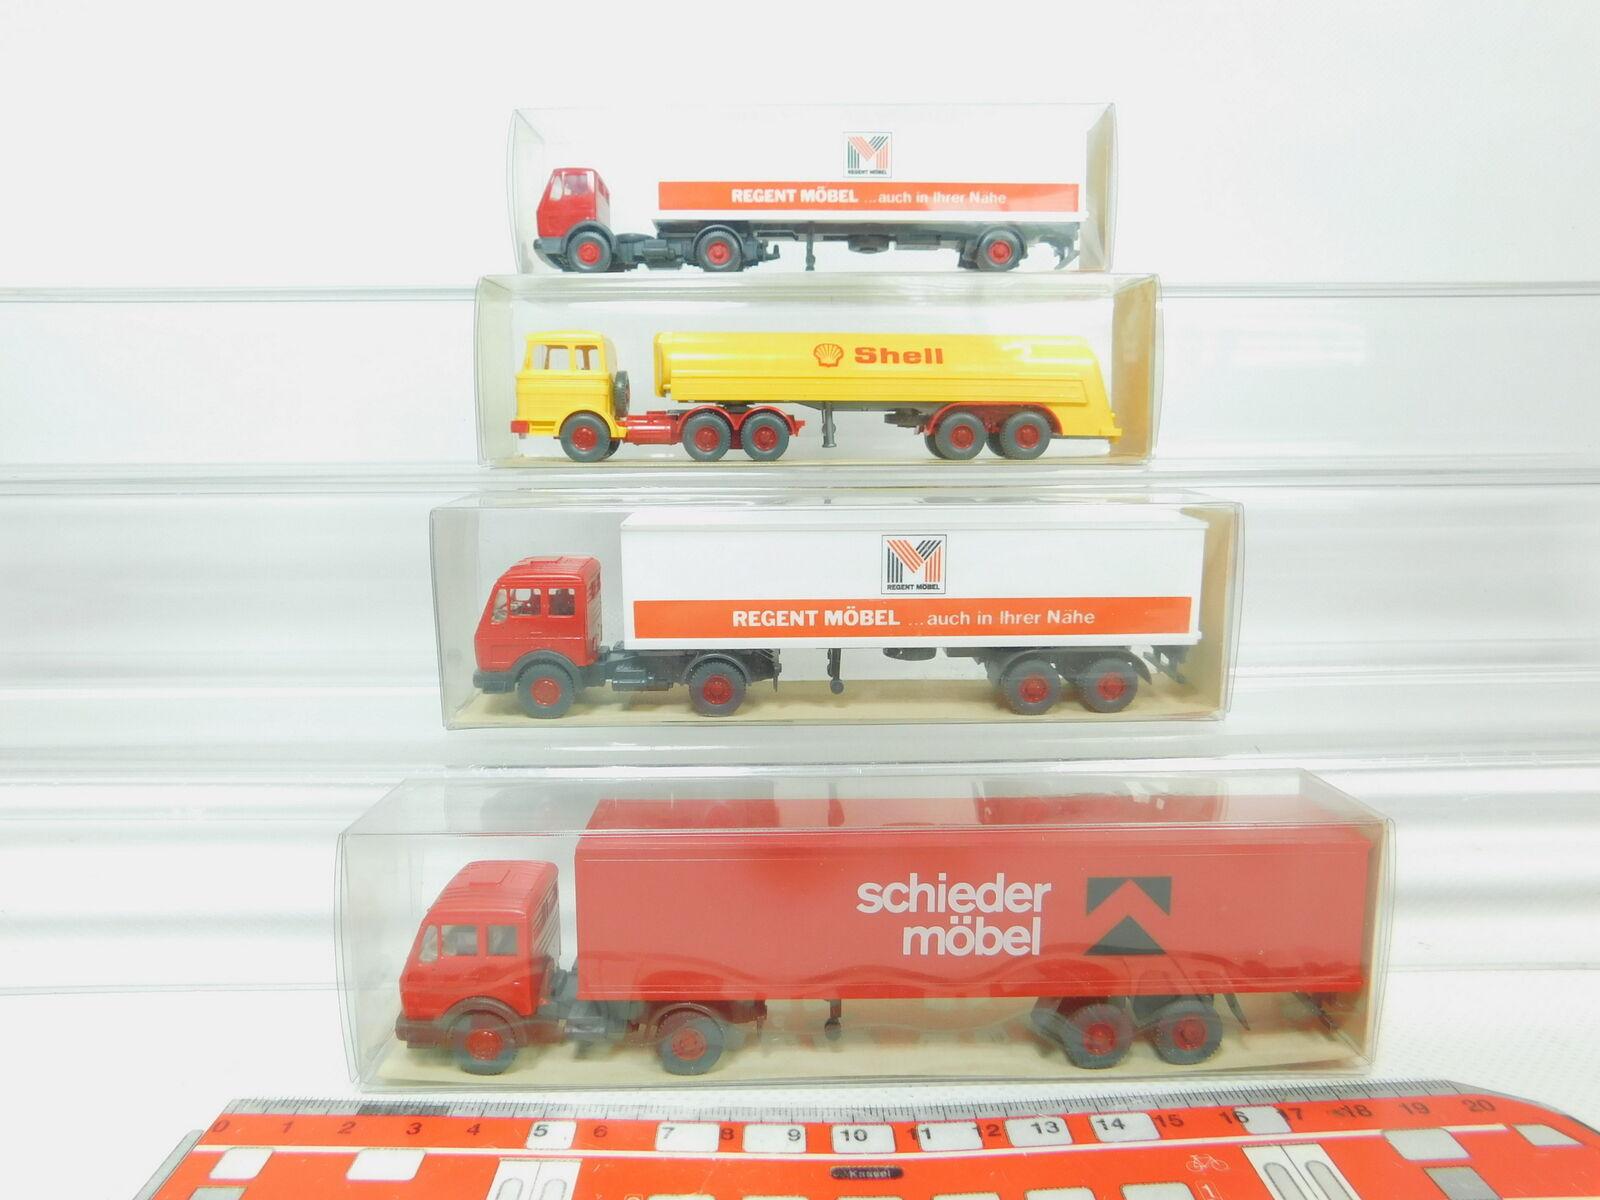 Bn42-0, 5 5 5  4x Wiking h0 1 87 camion Mercedes Mb  802 Shell +542+545+547, Neuw + neuf dans sa boîte d2df84